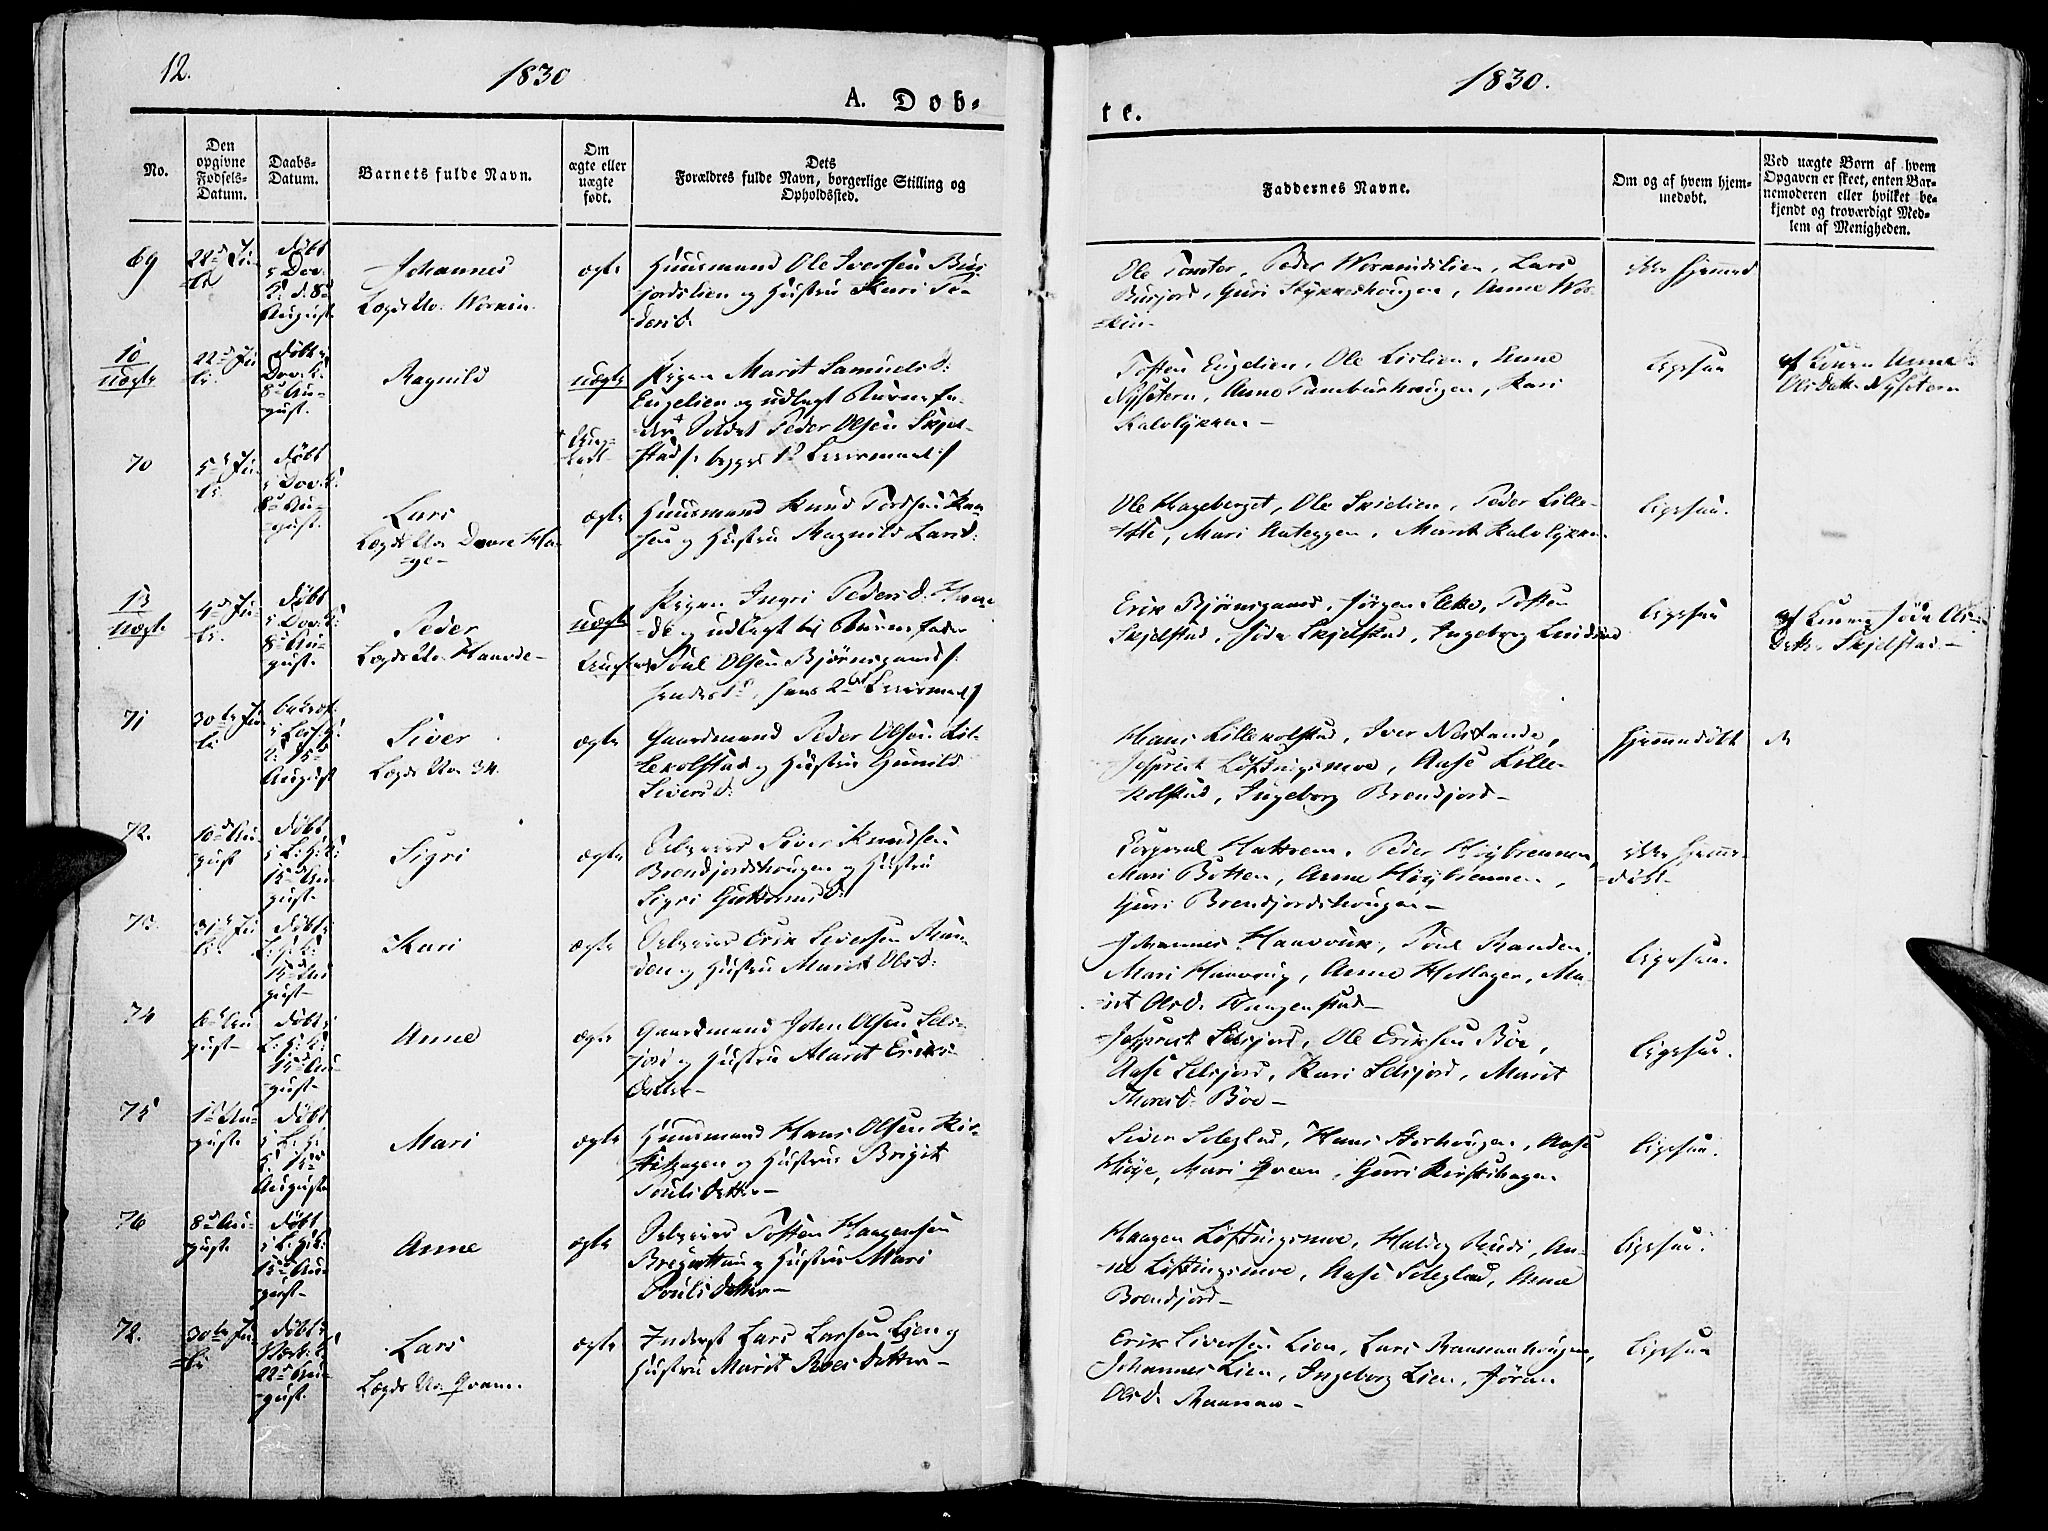 SAH, Lesja prestekontor, Ministerialbok nr. 5, 1830-1842, s. 12